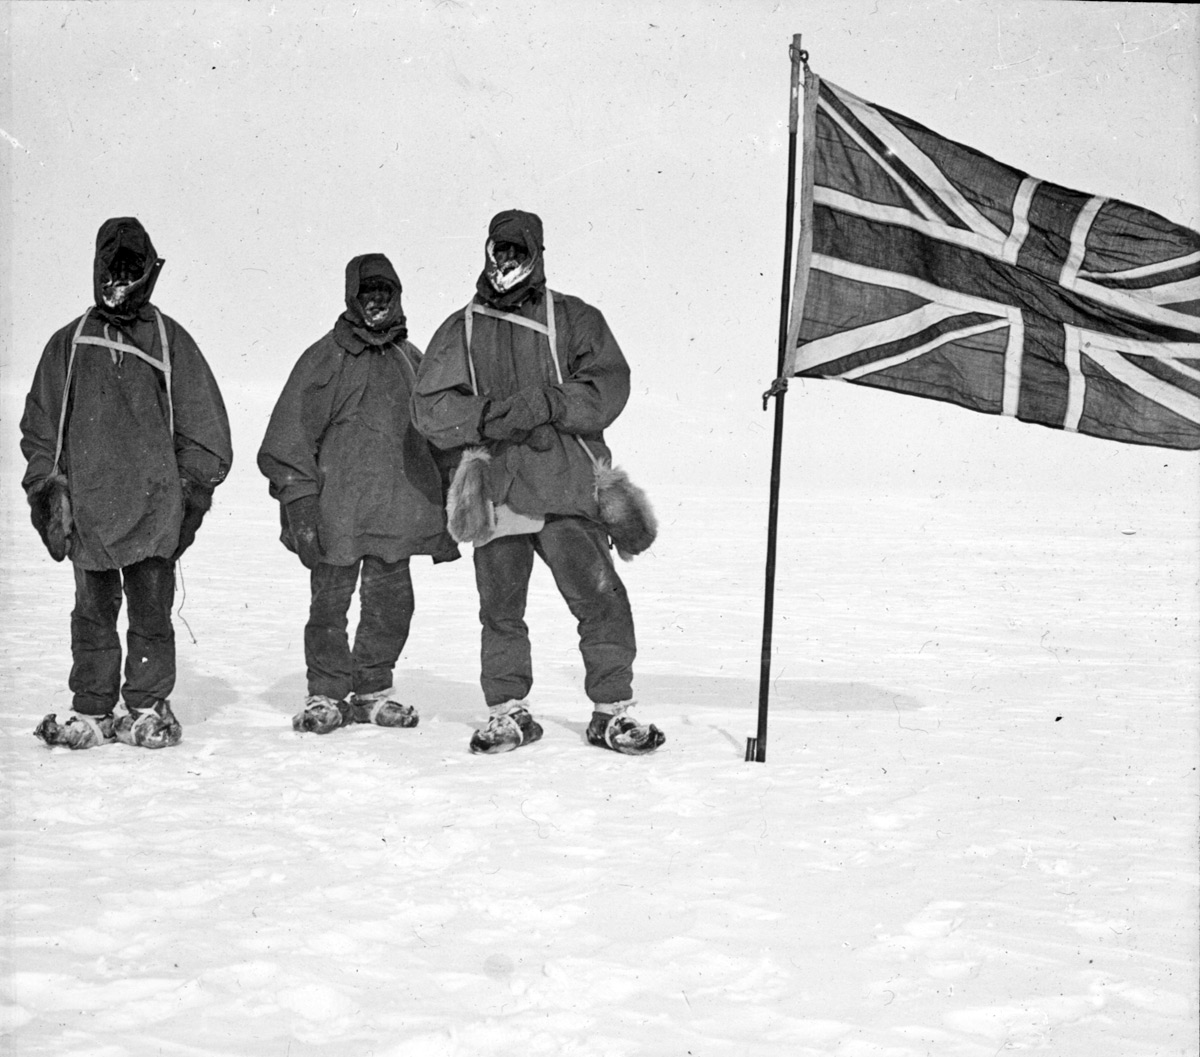 Ernest Shackleton - Wikipedia